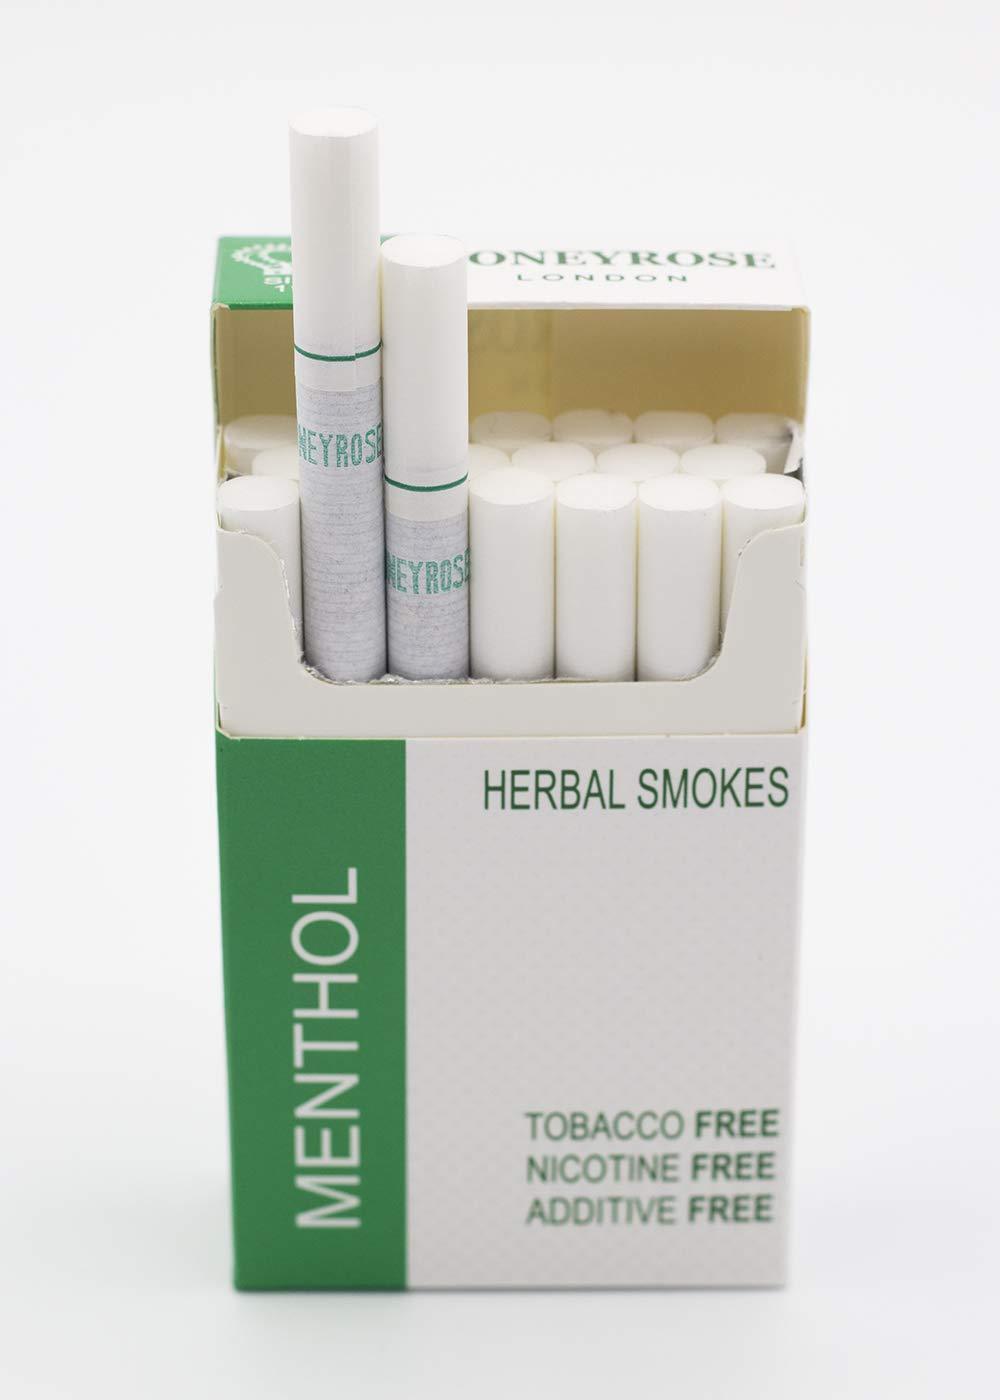 honeyrose menthol herbal cigarettes review